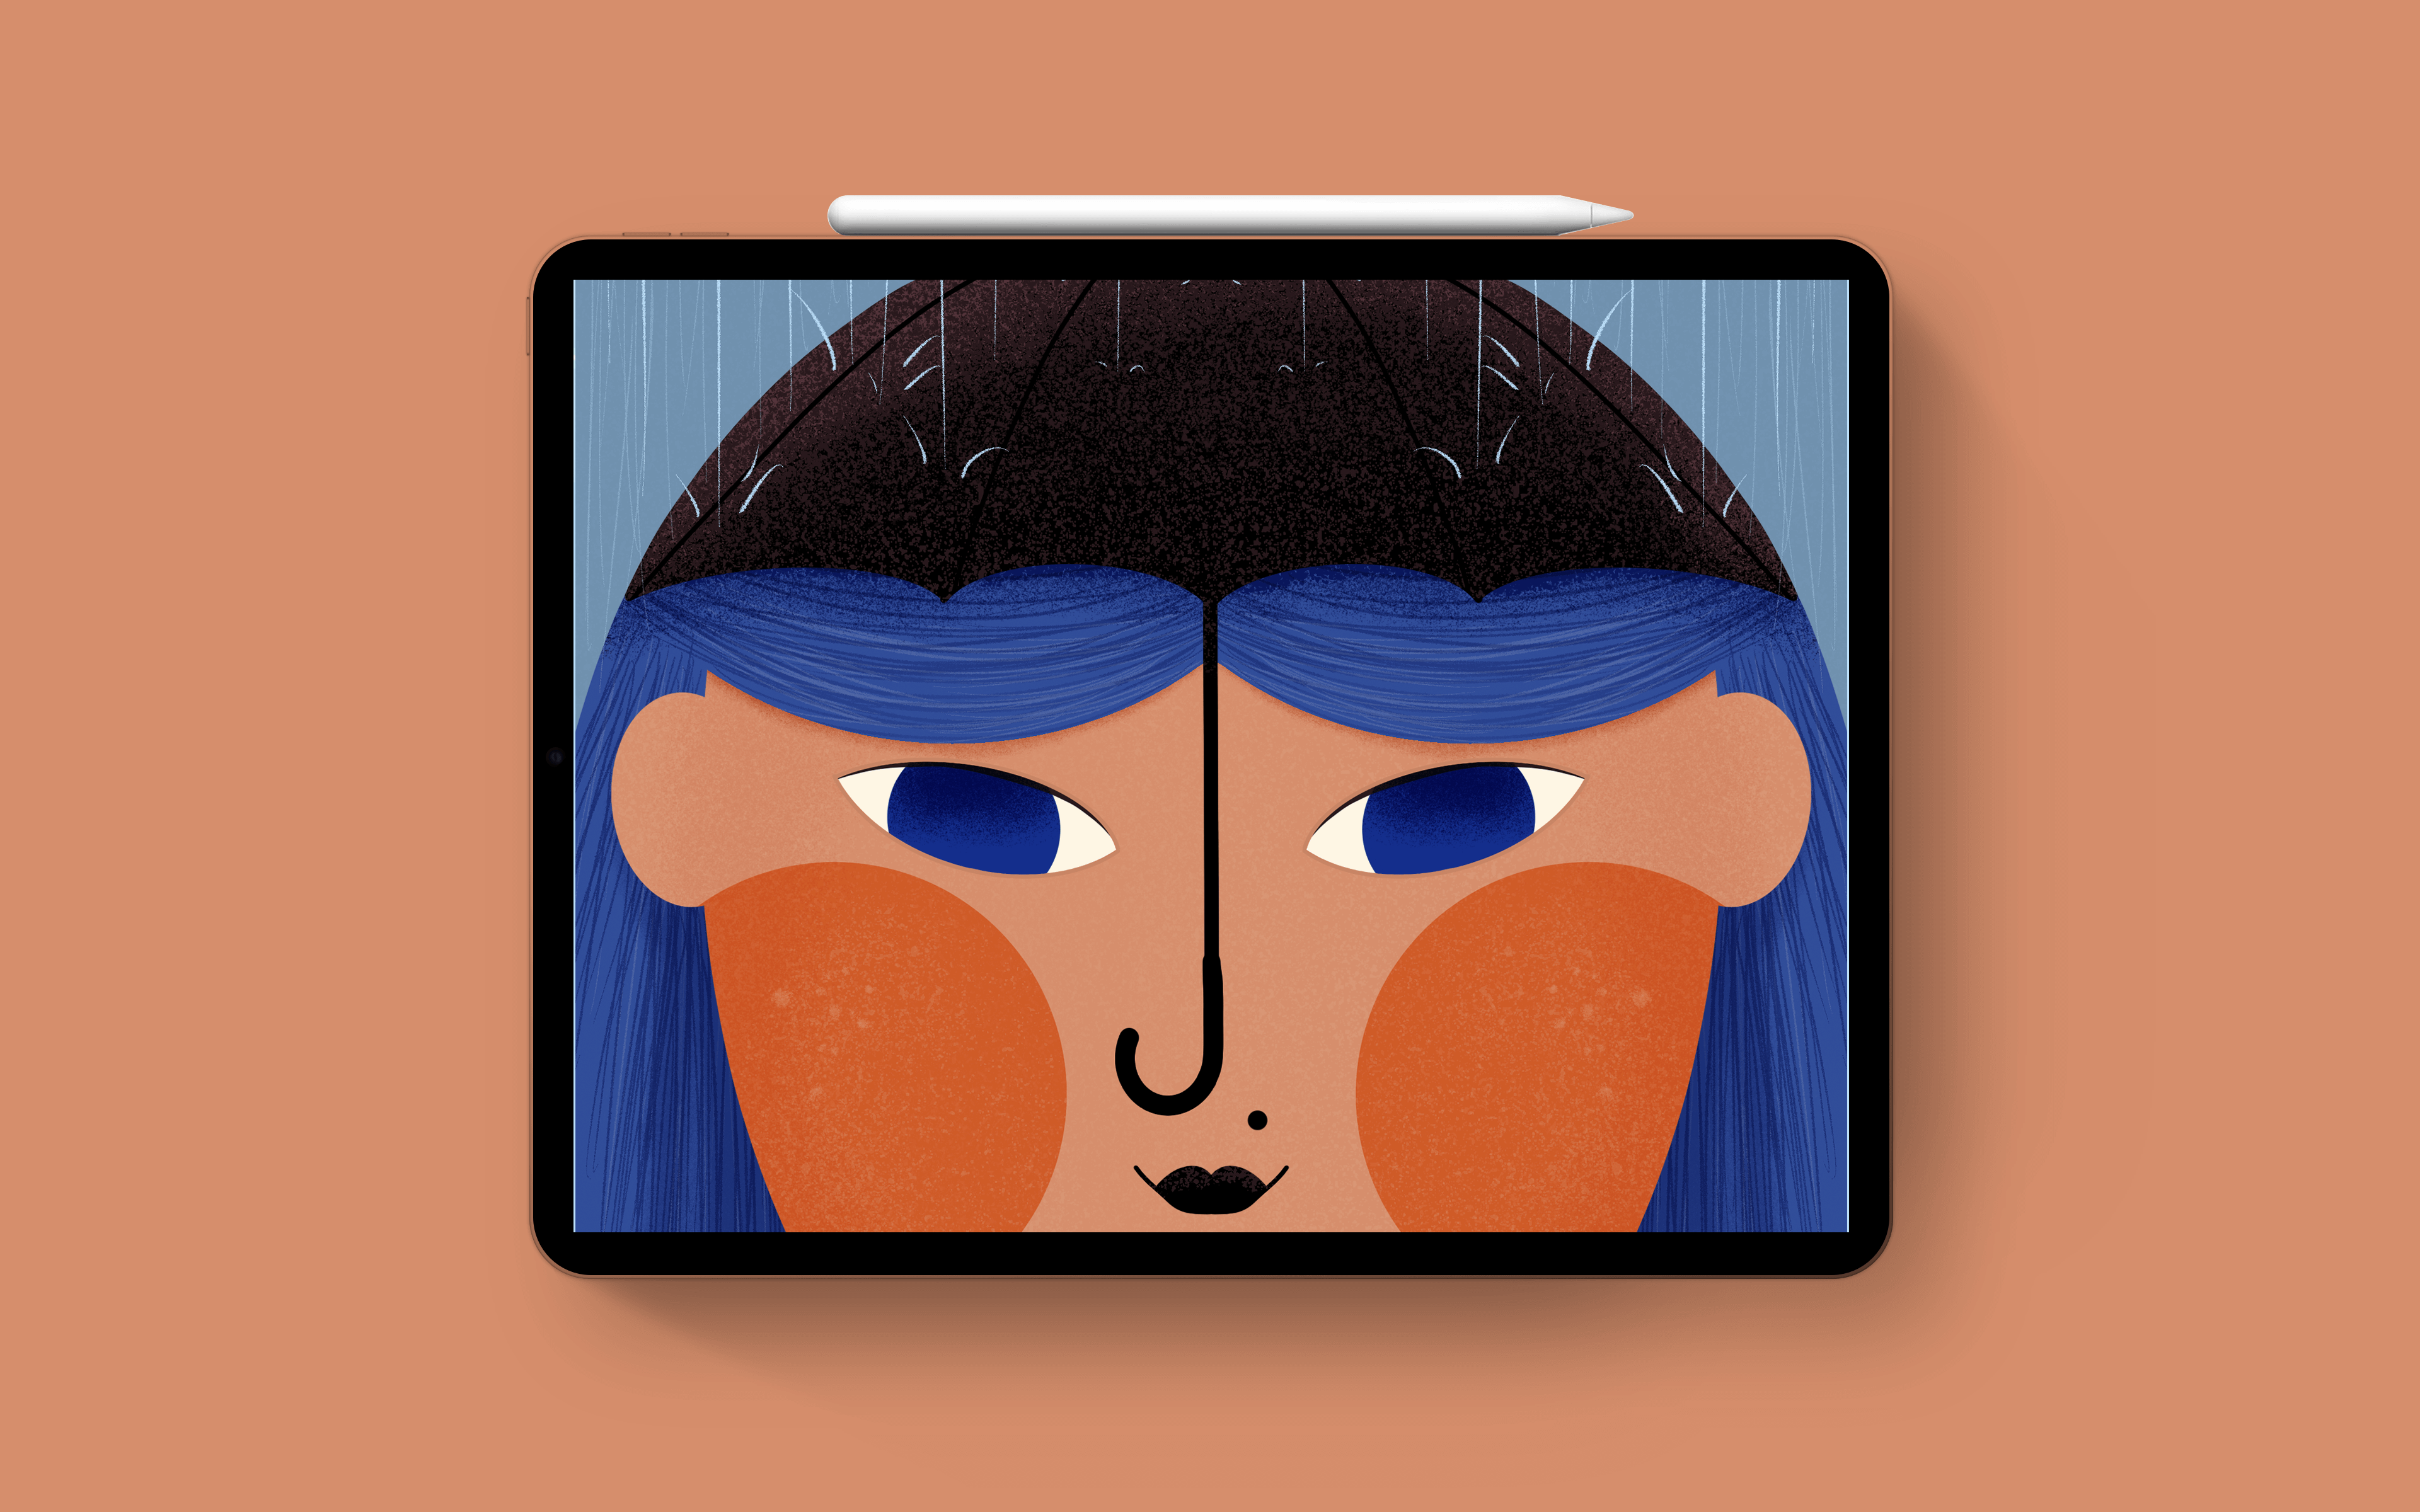 Digital Illustrations about Mental Health